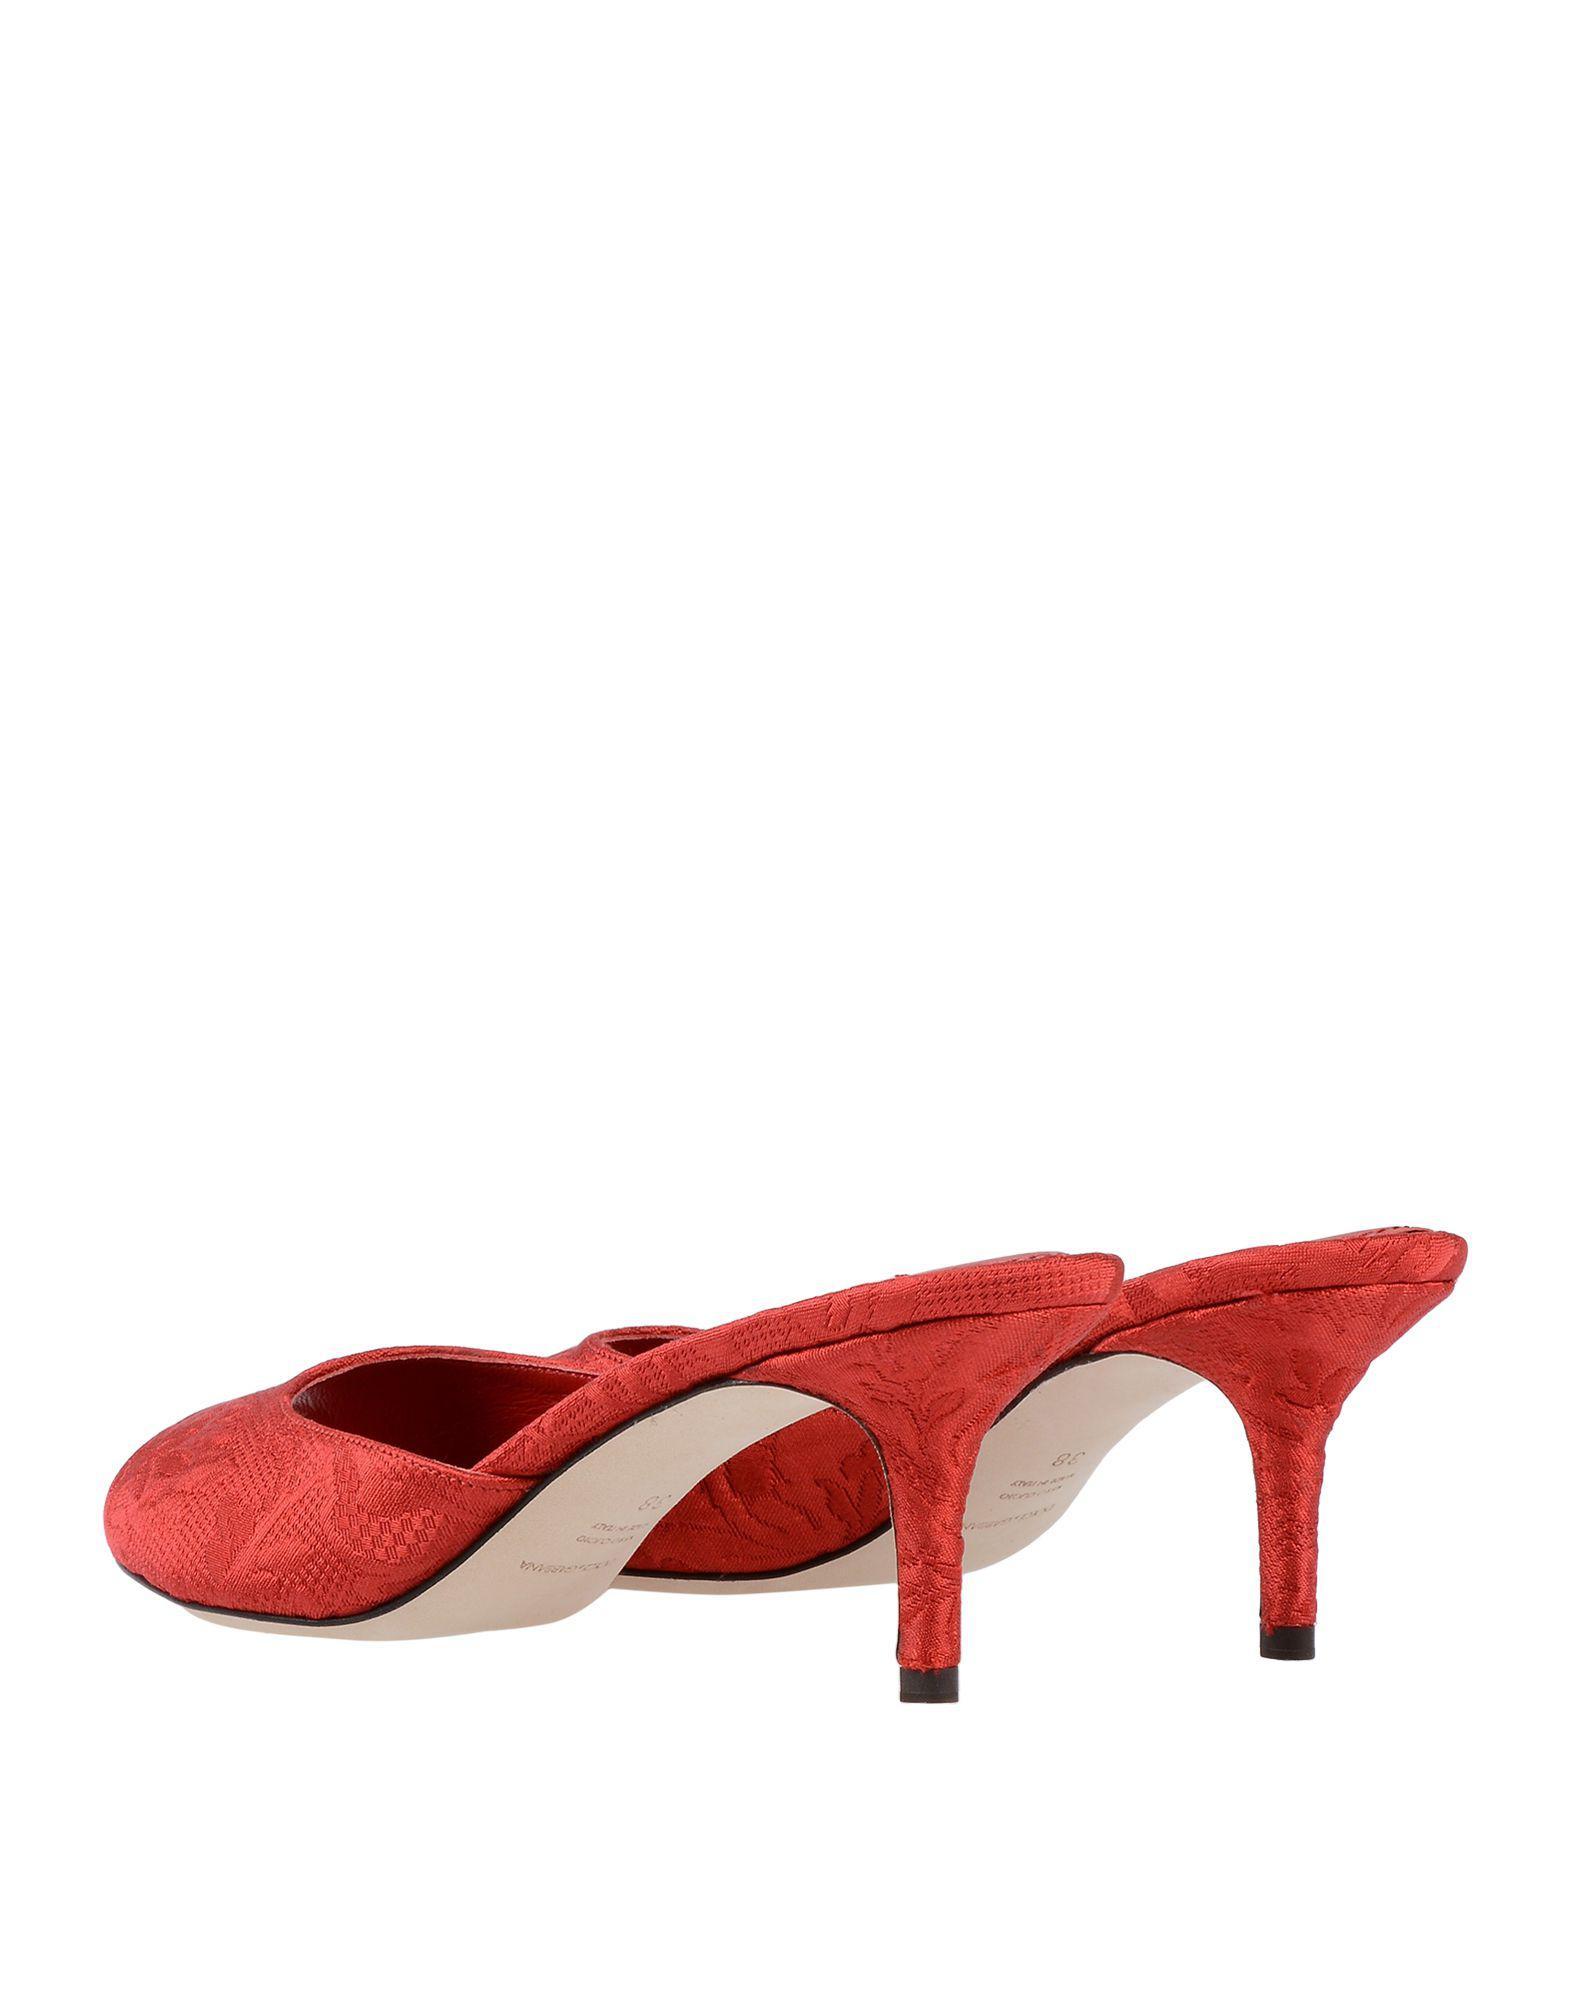 ba4fa9489faa Lyst - Dolce   Gabbana Sandals in Red